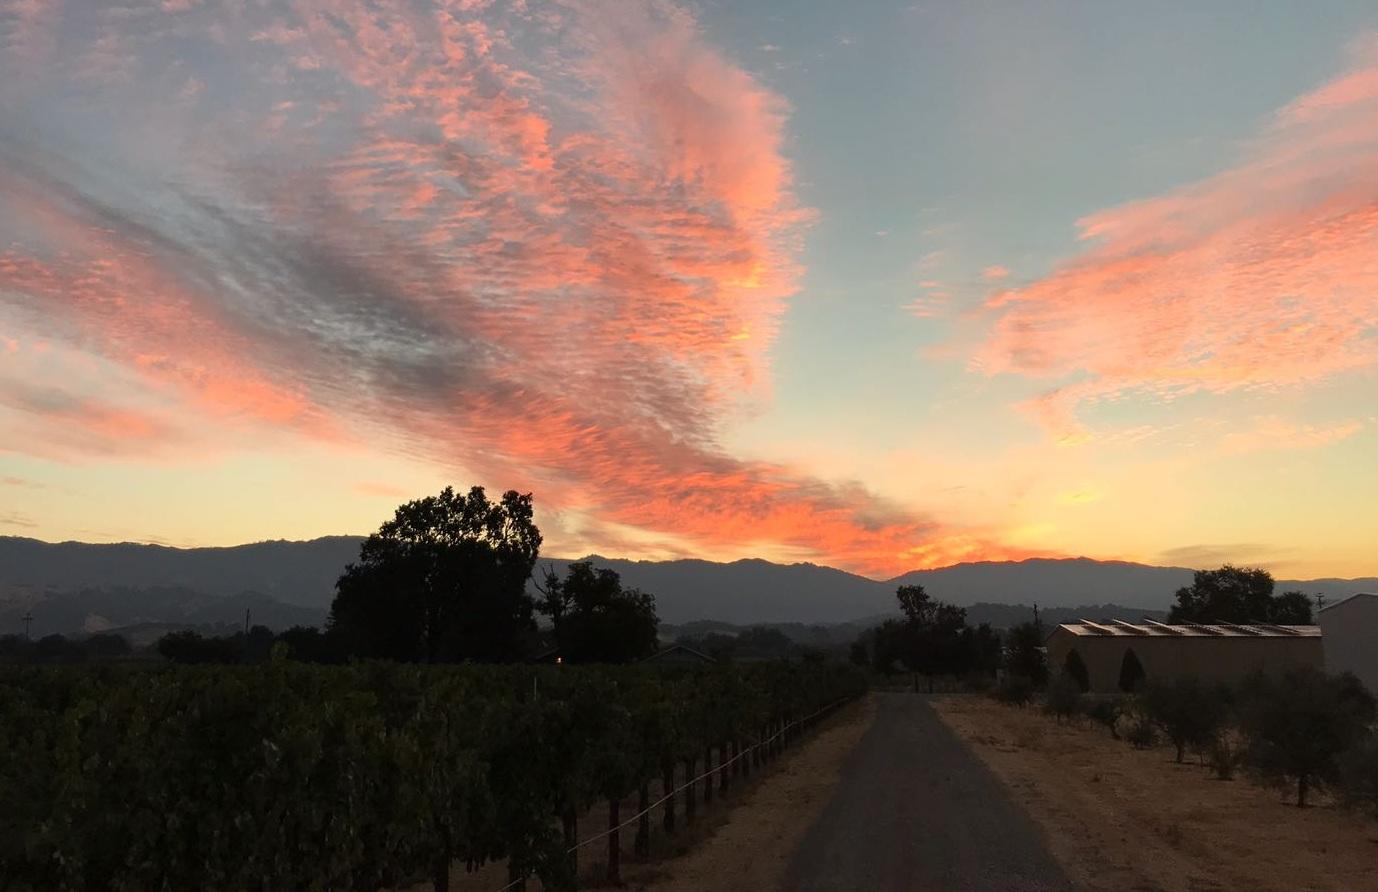 Vineyard sunset scene